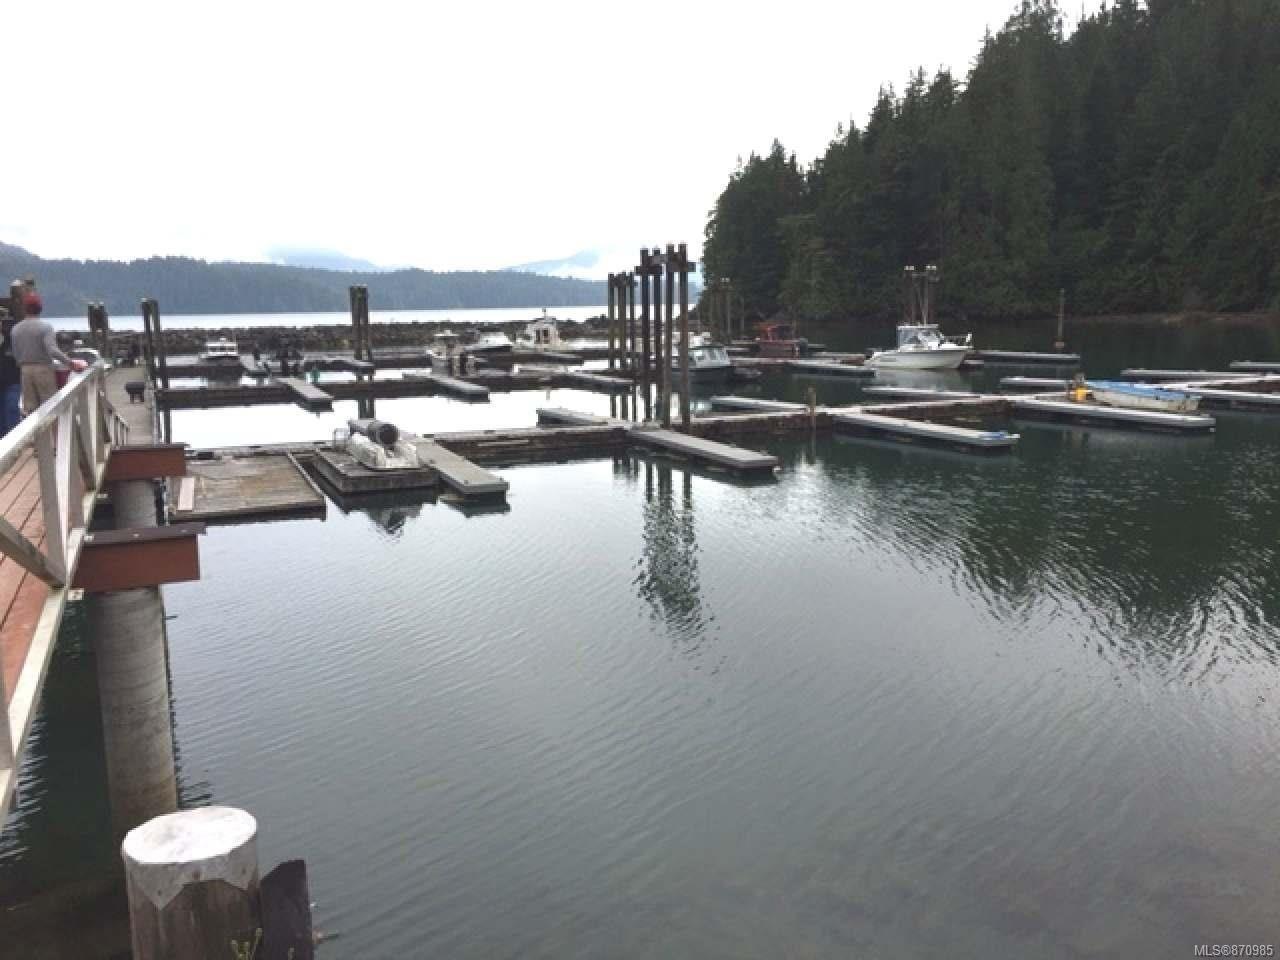 Main Photo: Lot 55 Haggard Cove in : PA Alberni Inlet Land for sale (Port Alberni)  : MLS®# 870985